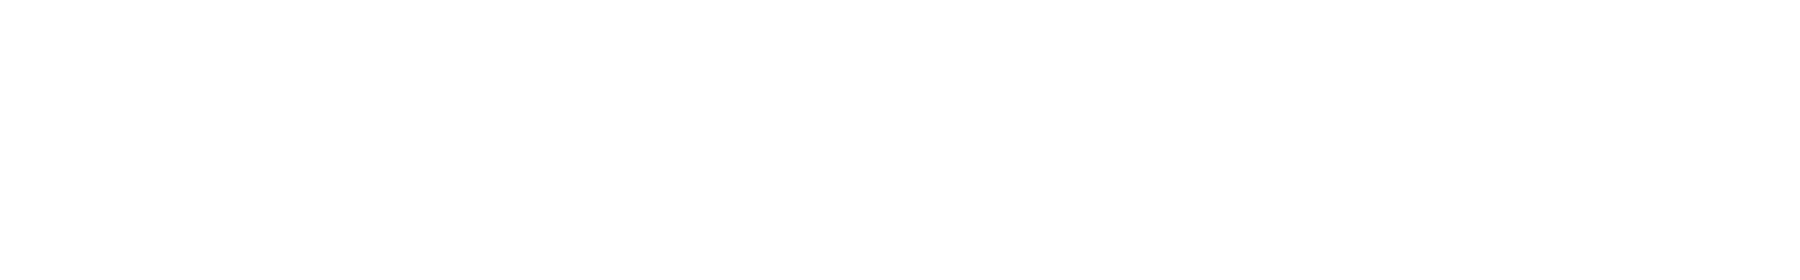 90 c 6